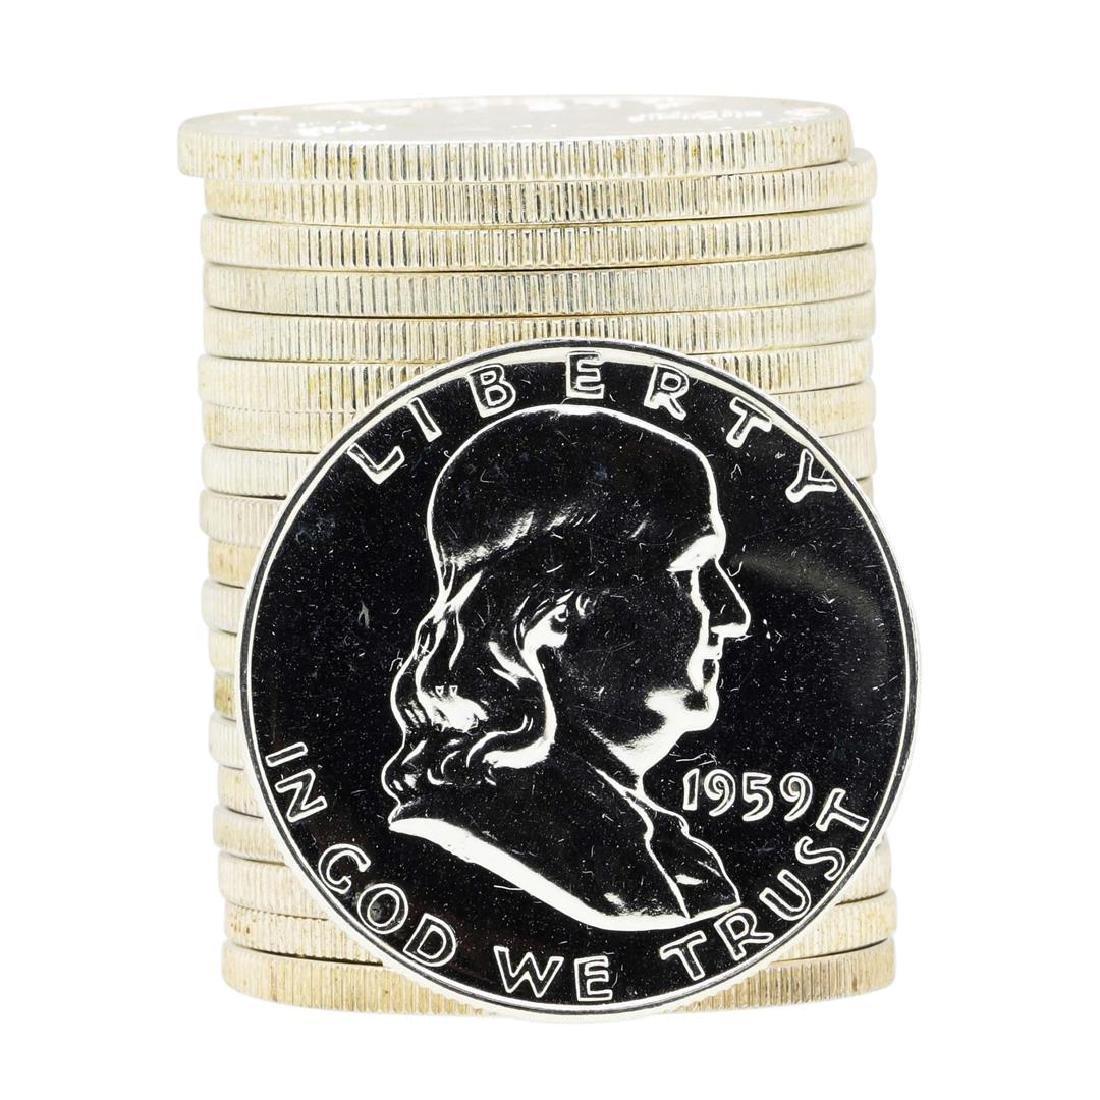 Roll of (20) 1961 Proof Franklin Half Dollar Silver